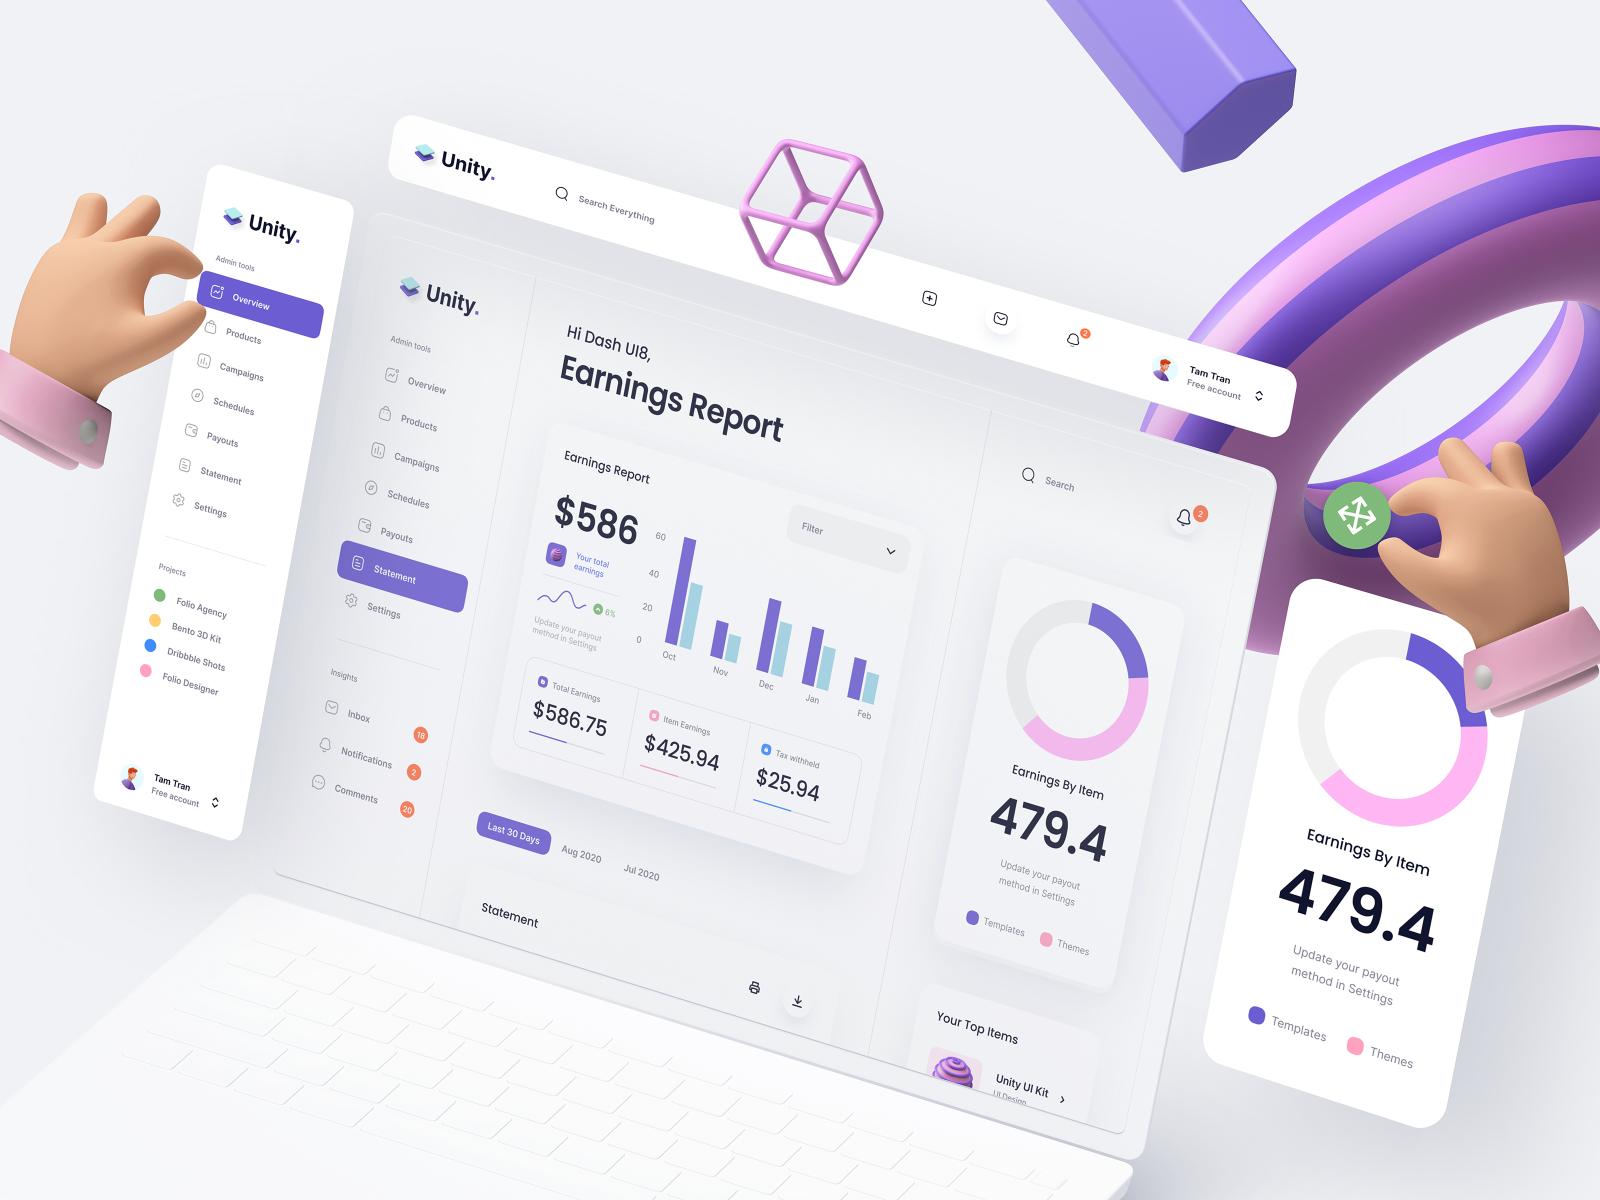 Unity Dashboard Kit – Earnings Report analytics ui kit dashboard kit typography app website mockup minimal clean dashboard chart earning 3d design 3d icon 3d hand 3d ux design ui ux ui design